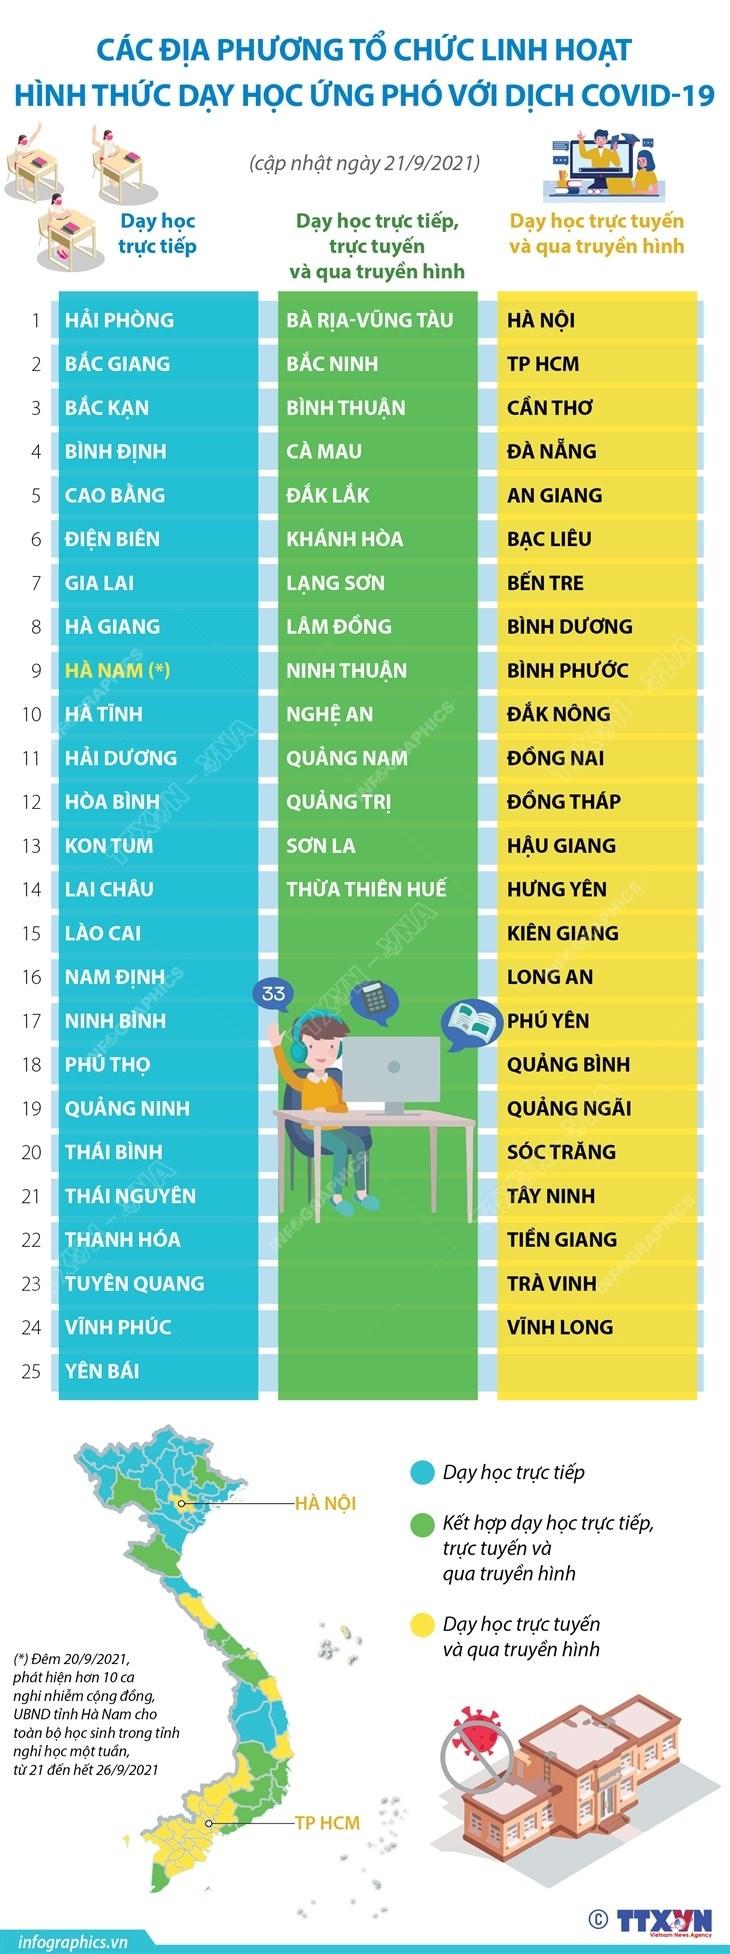 [Infographics] Hinh thuc day hoc cua cac dia phuong trong mua dich hinh anh 1